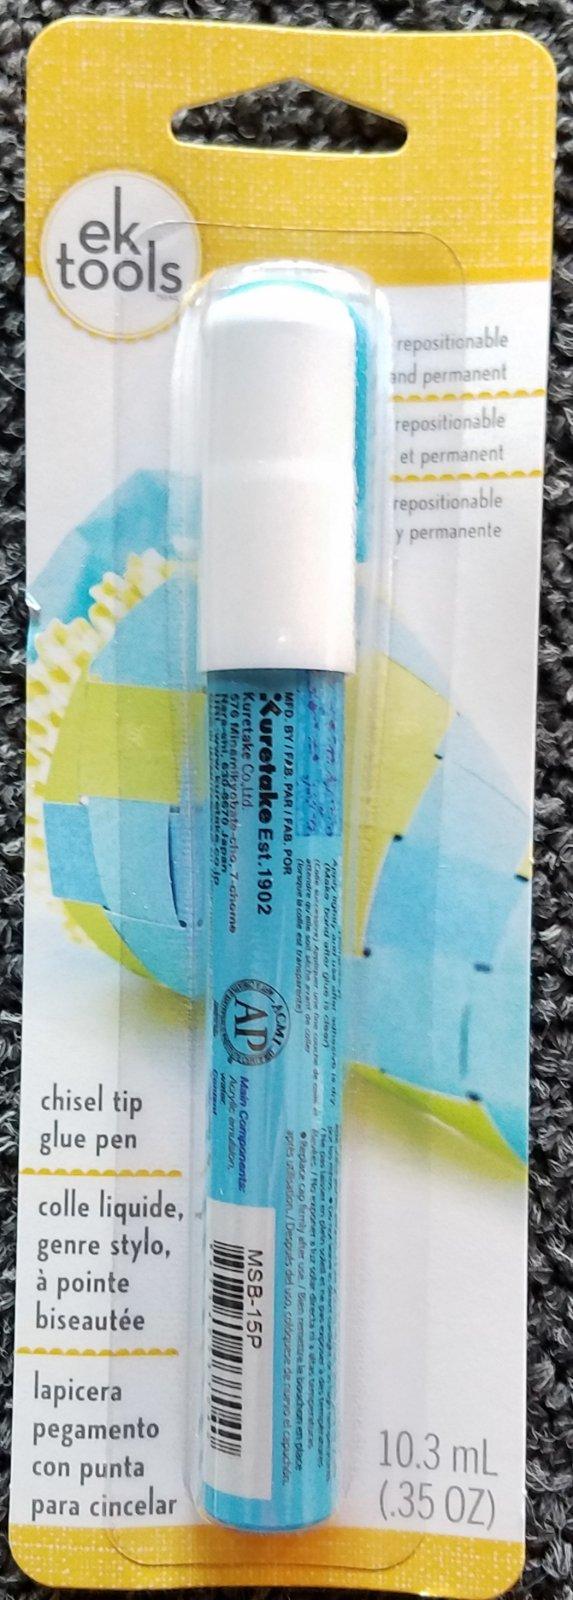 Zig Glue Pen - Chisel Tip